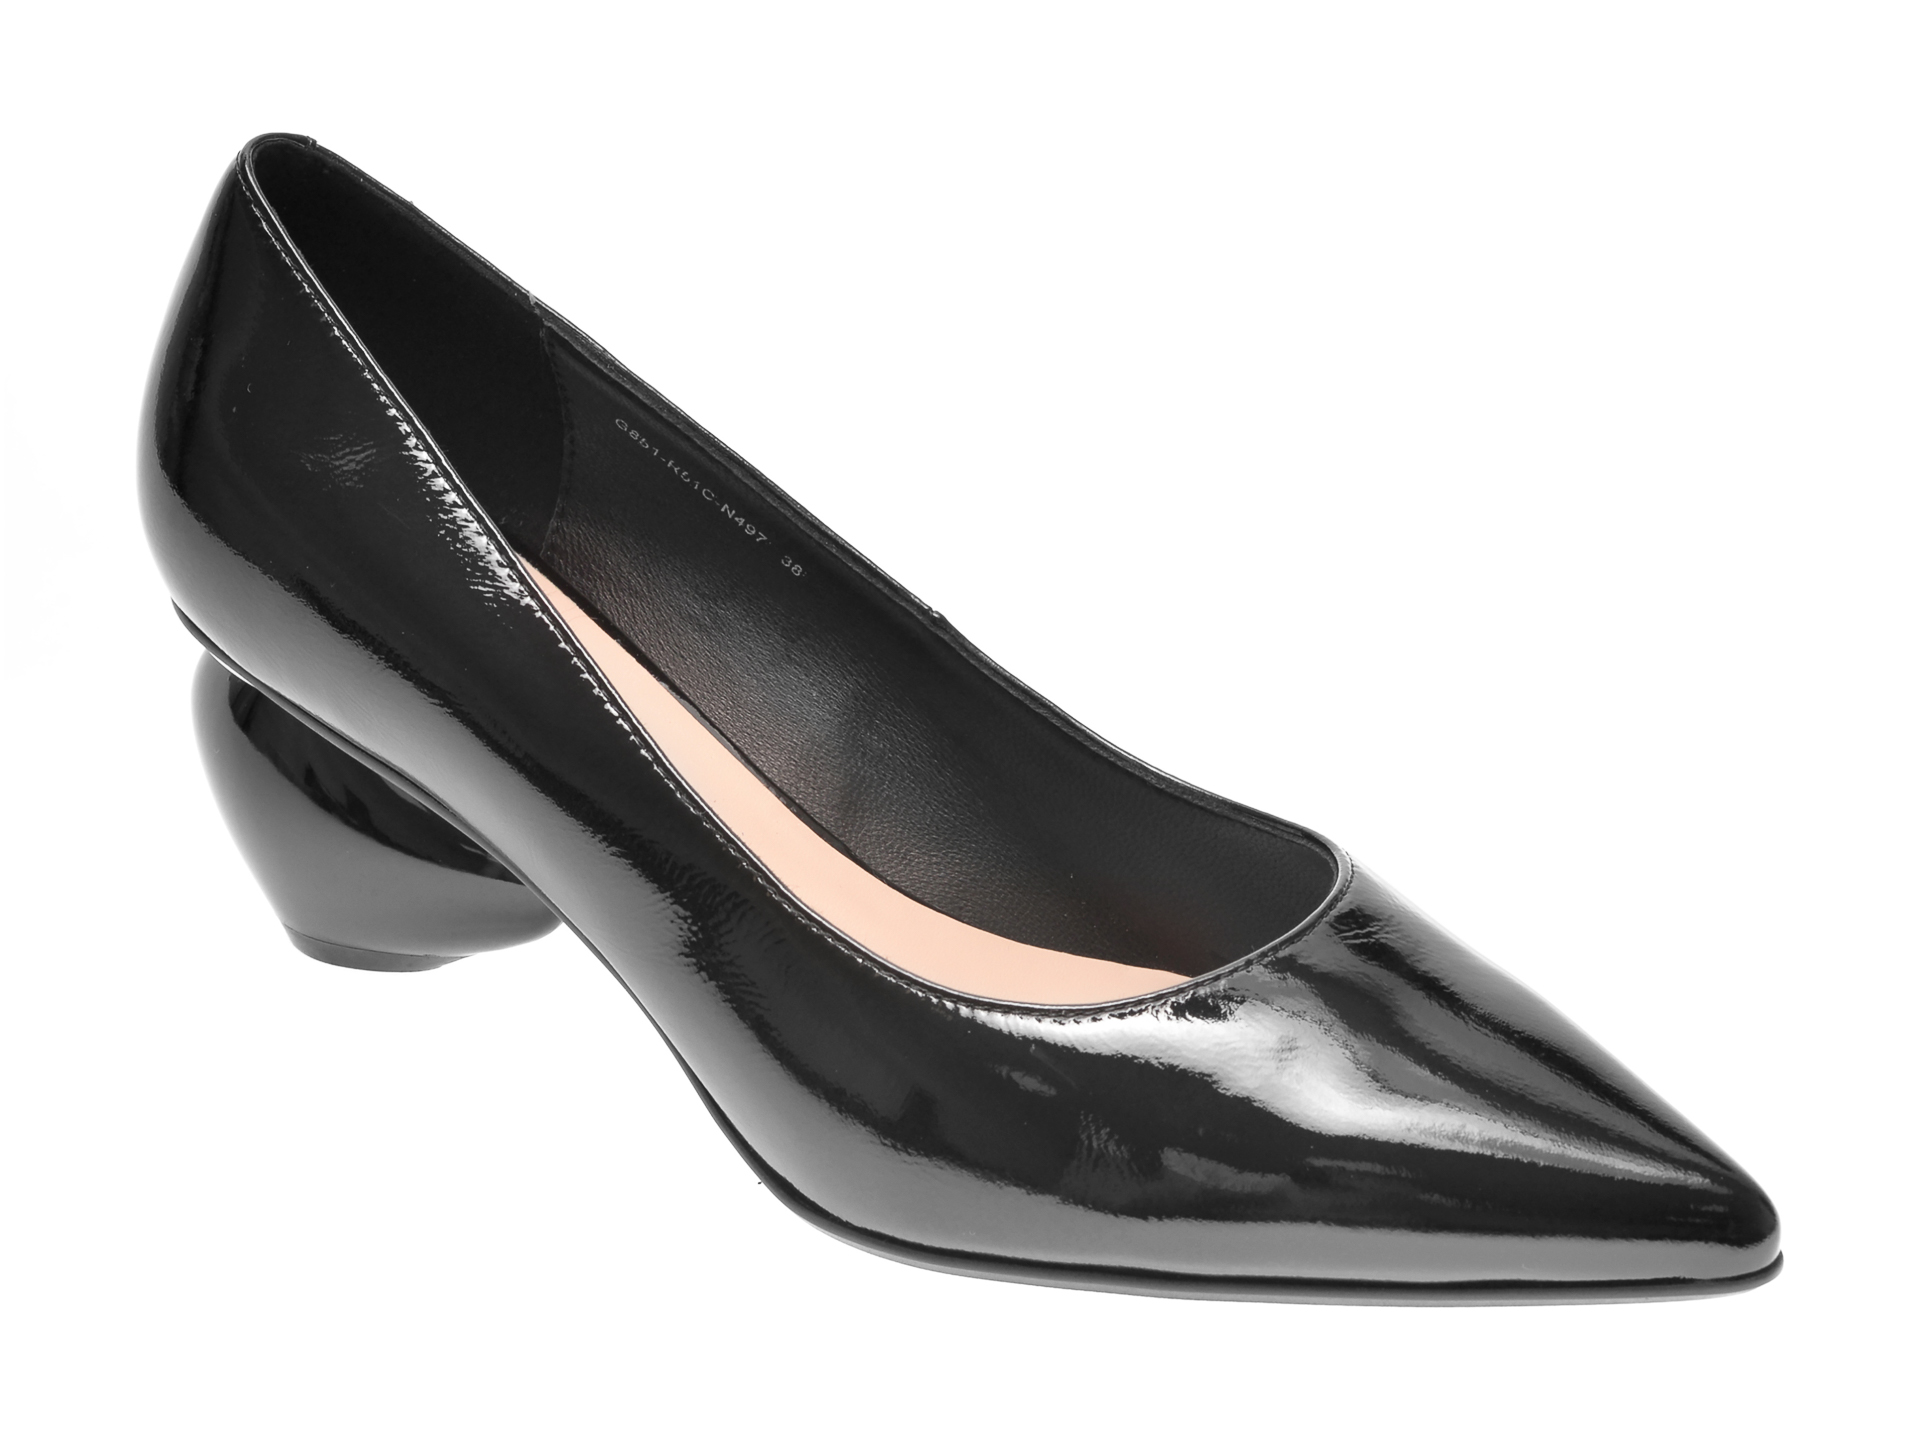 Pantofi EPICA negri, G851R51, din piele naturala lacuita imagine otter.ro